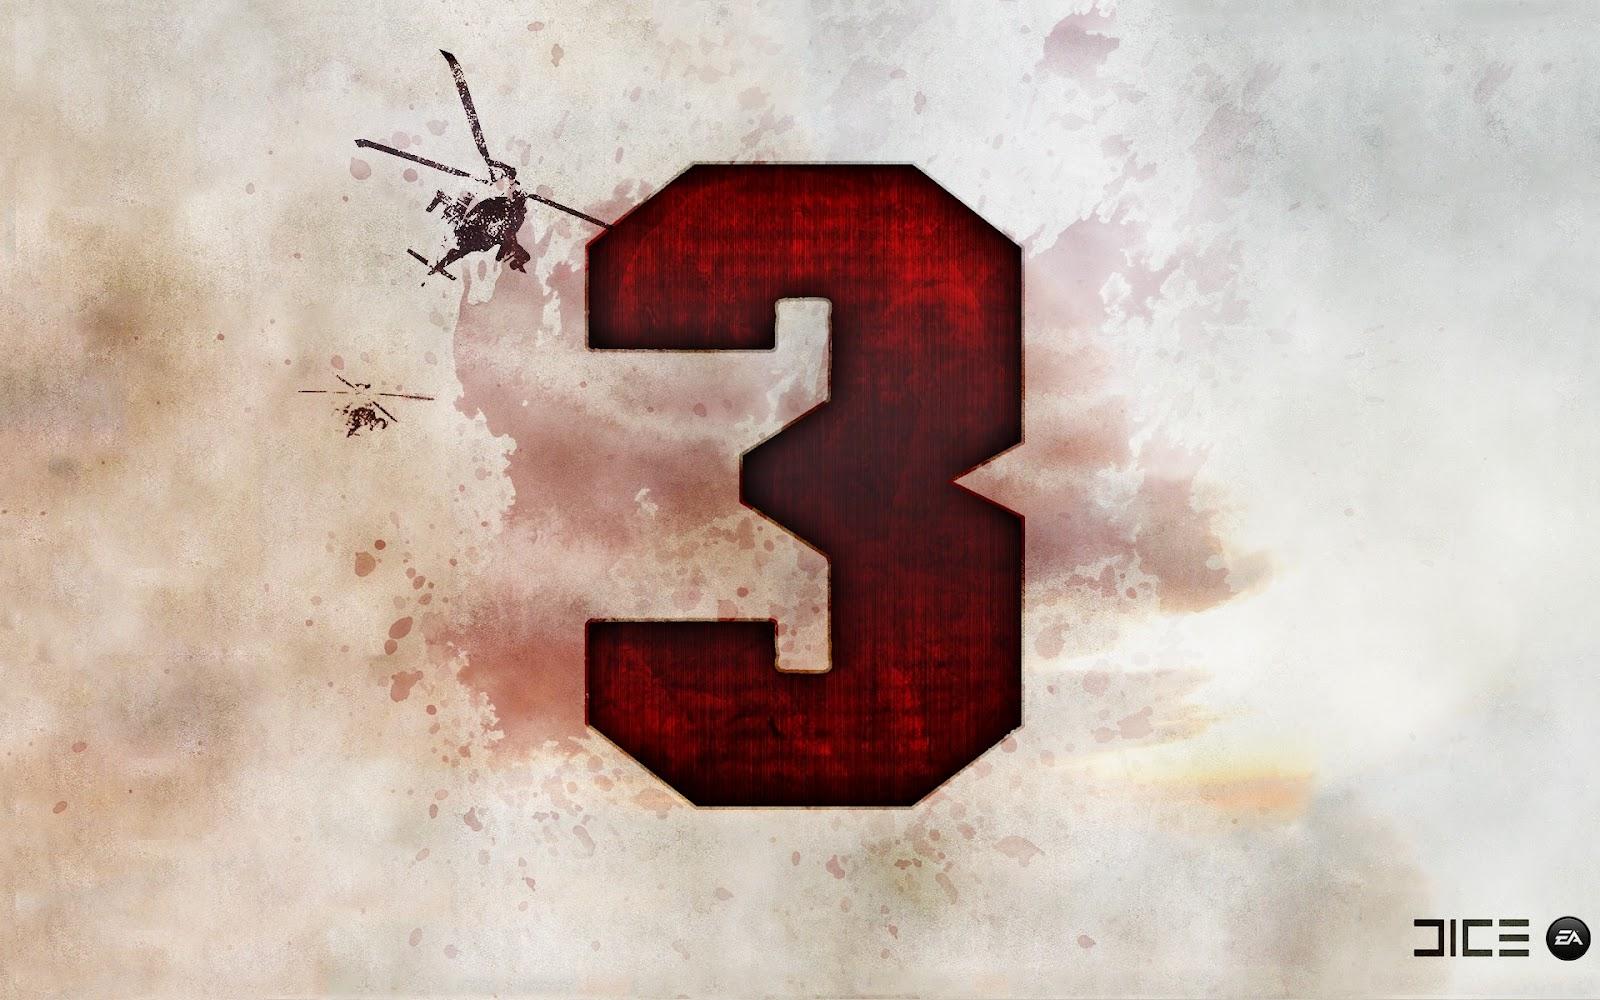 http://1.bp.blogspot.com/-398AJY4anLQ/T0k8kAPczSI/AAAAAAAAAt0/ASnXq2x2PTs/s1600/Battlefield_3_Logo_Awesome_HD_Game_Wallpaper-gWb.jpg